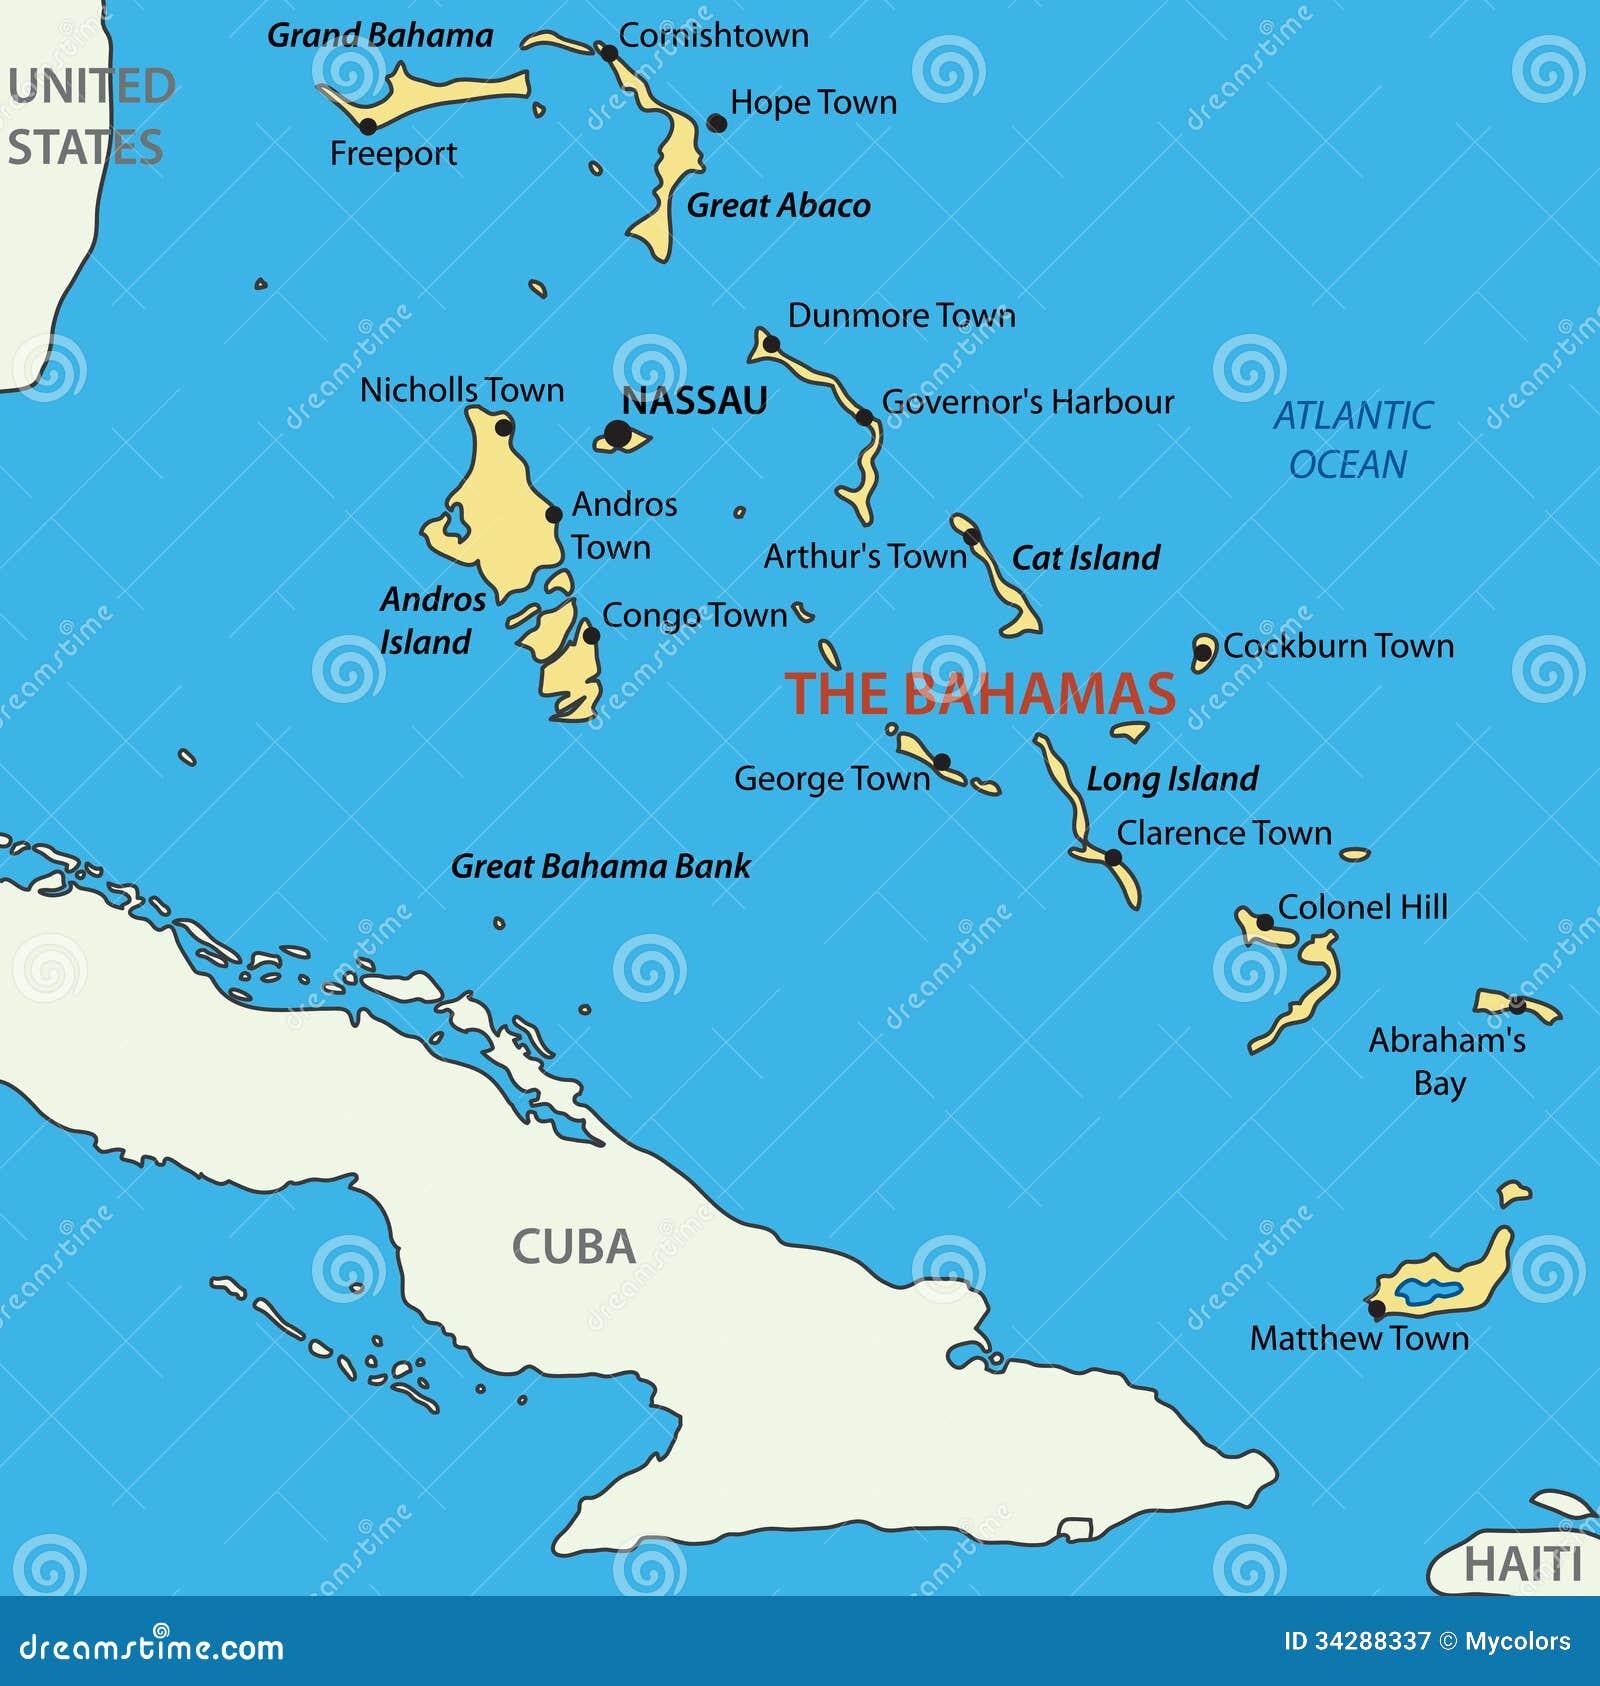 Habitat on web habitat technology group - Commonwealth Of The Bahamas Vector Map Royalty Free